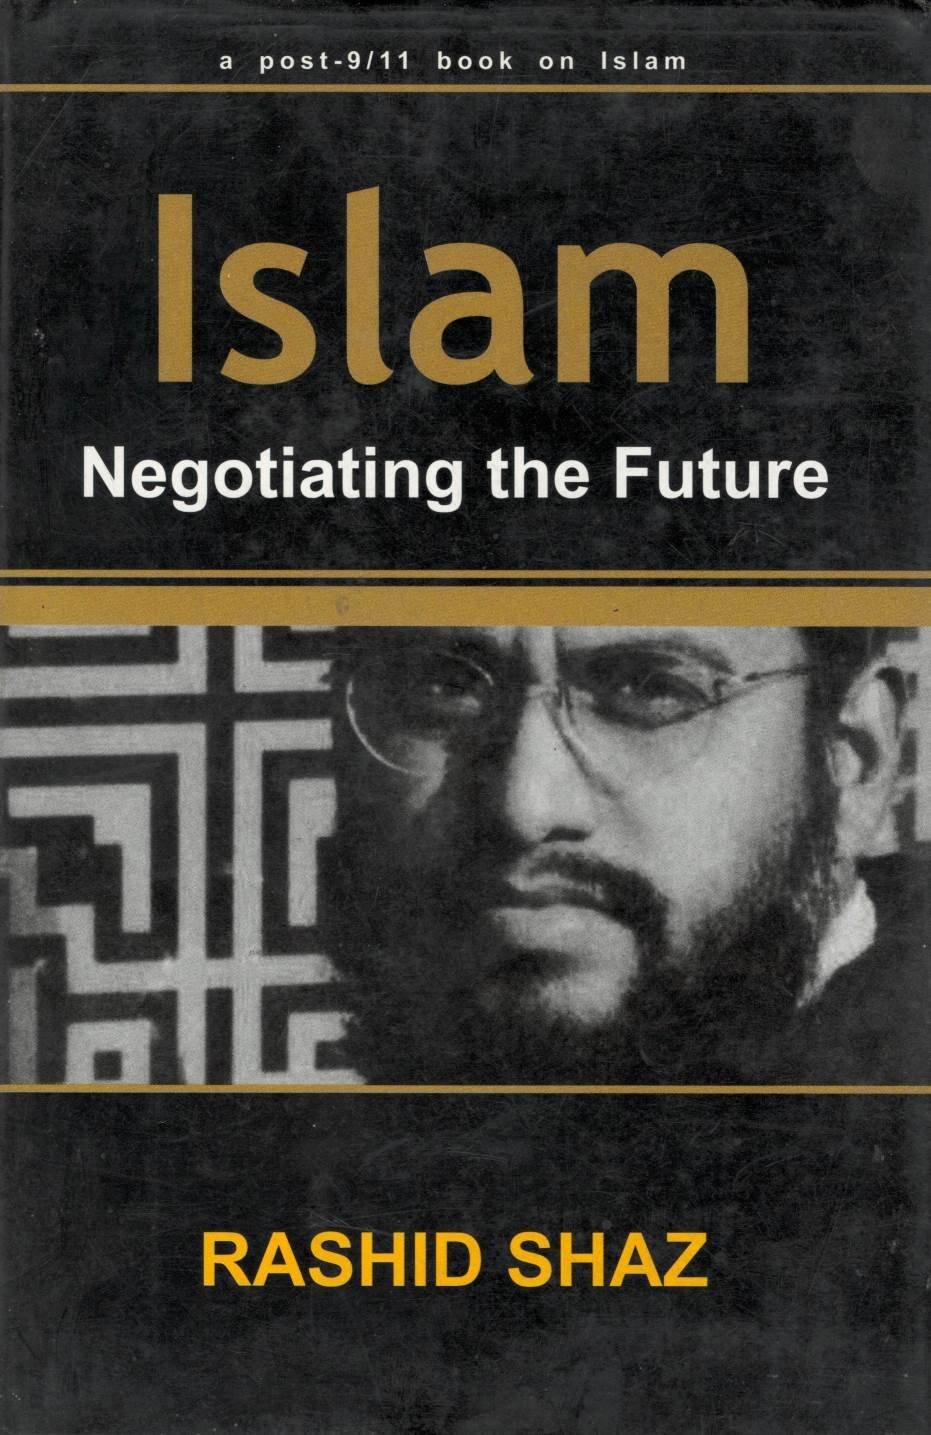 Download Islam: Negotiating the Future, A post-9/11 book on Islam (A post-9/11 book on Islam) ebook